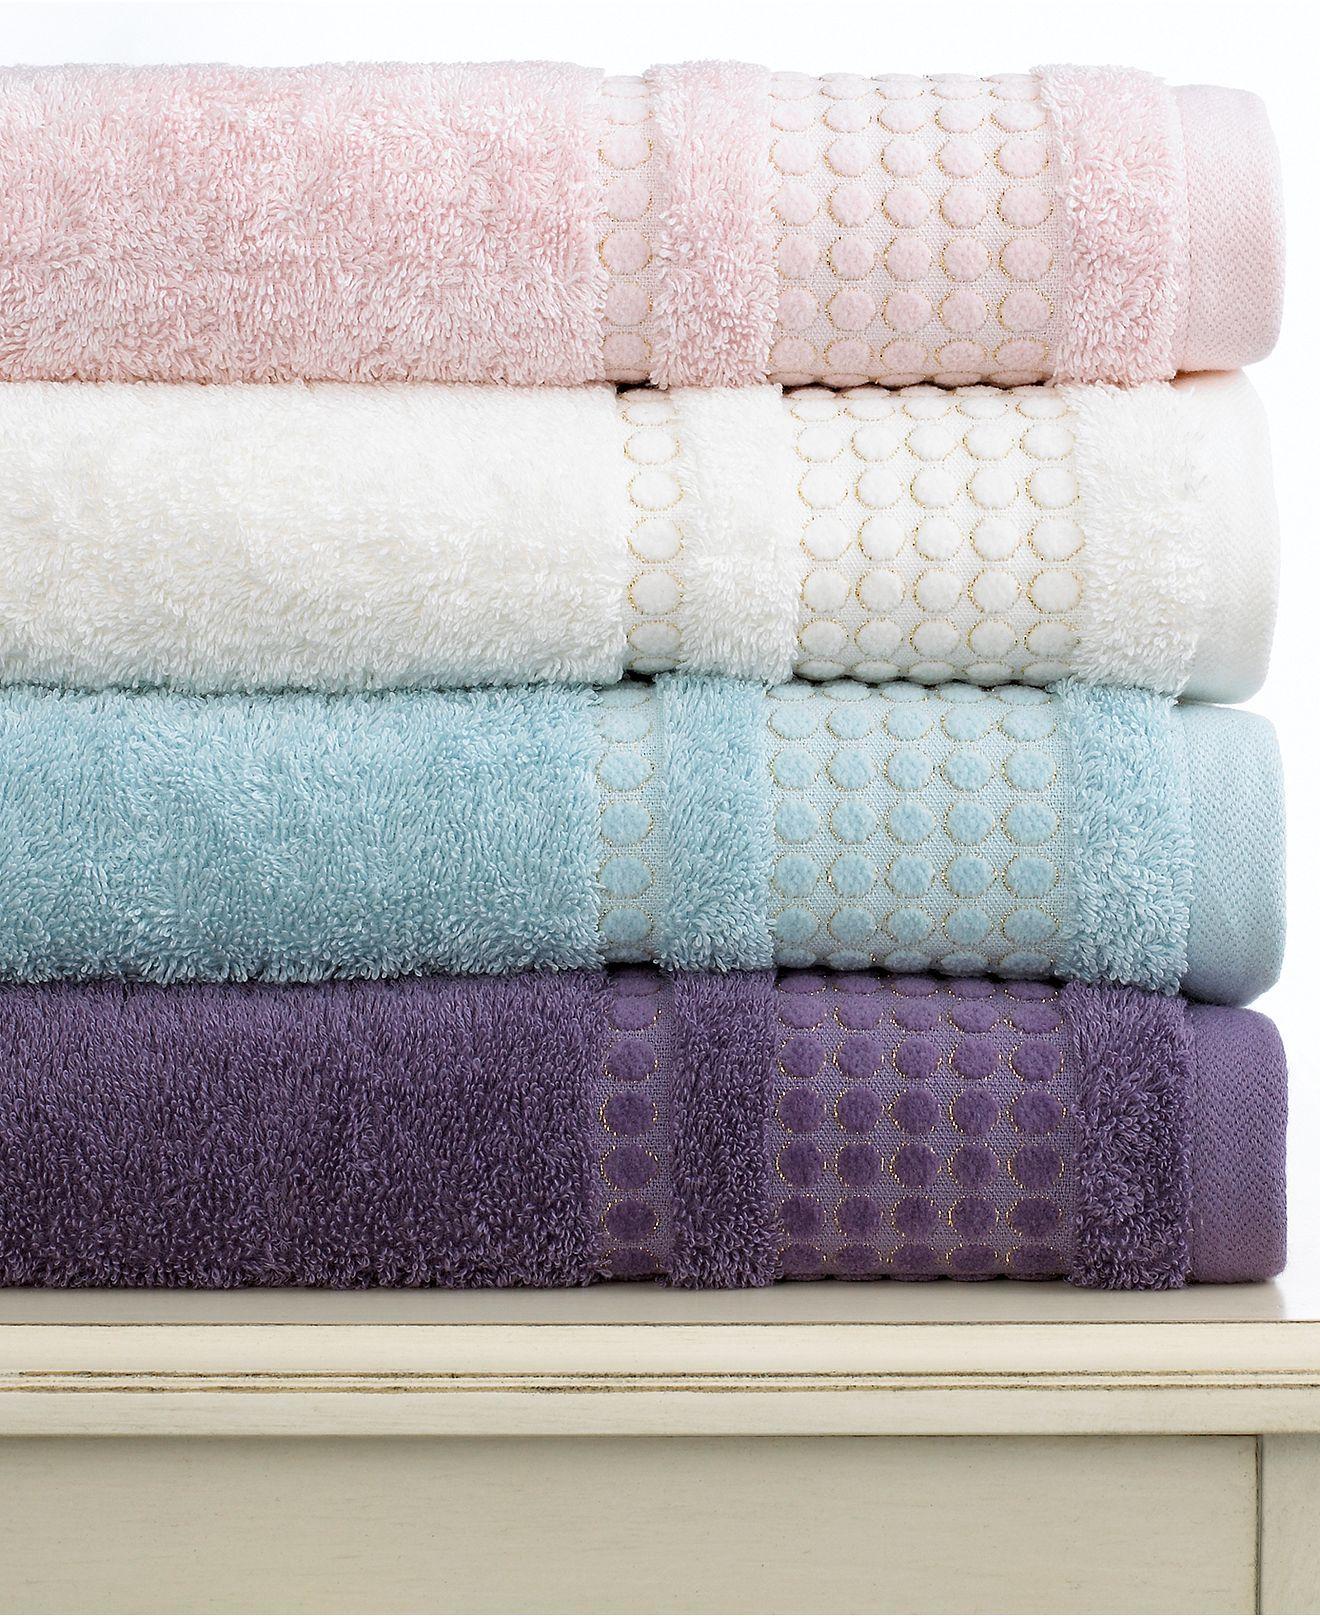 Bianca Bath Towels Art Deco Collection Bath Towels Bed Bath Macy S Cat Bath Bathroom Towels Towel Bath Towels